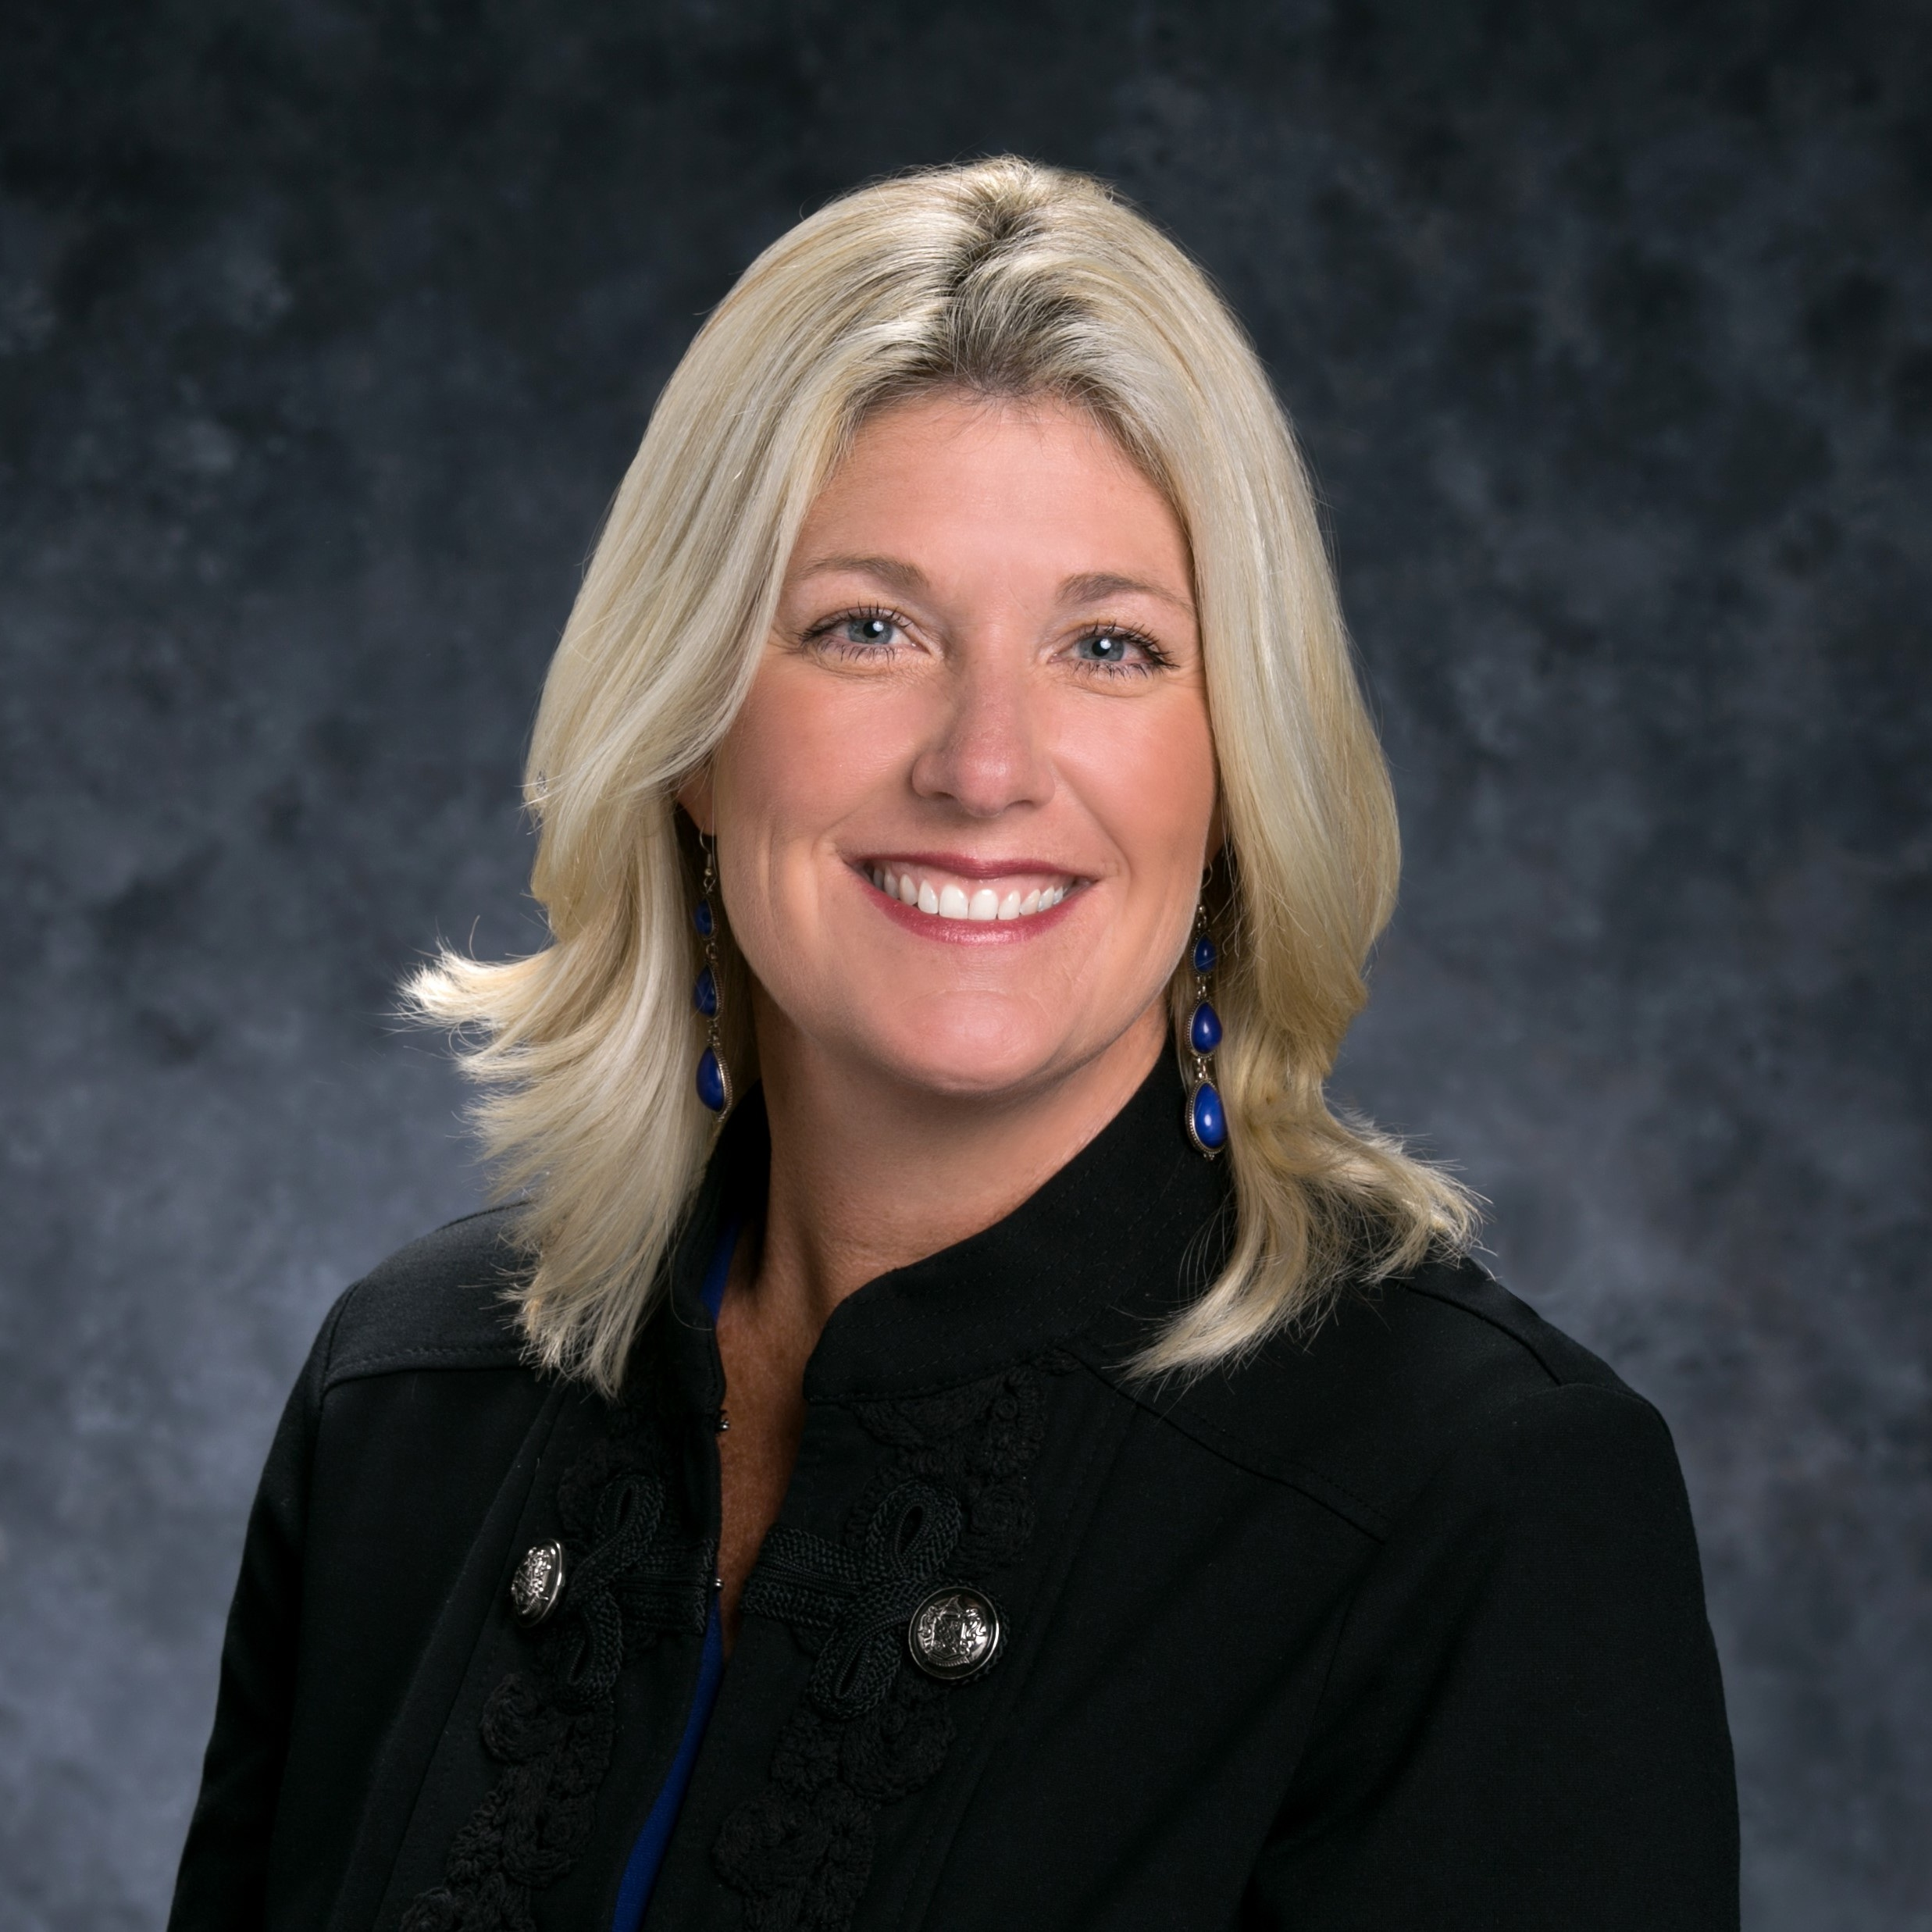 Melinda P. Brumfield - Director of Business Development